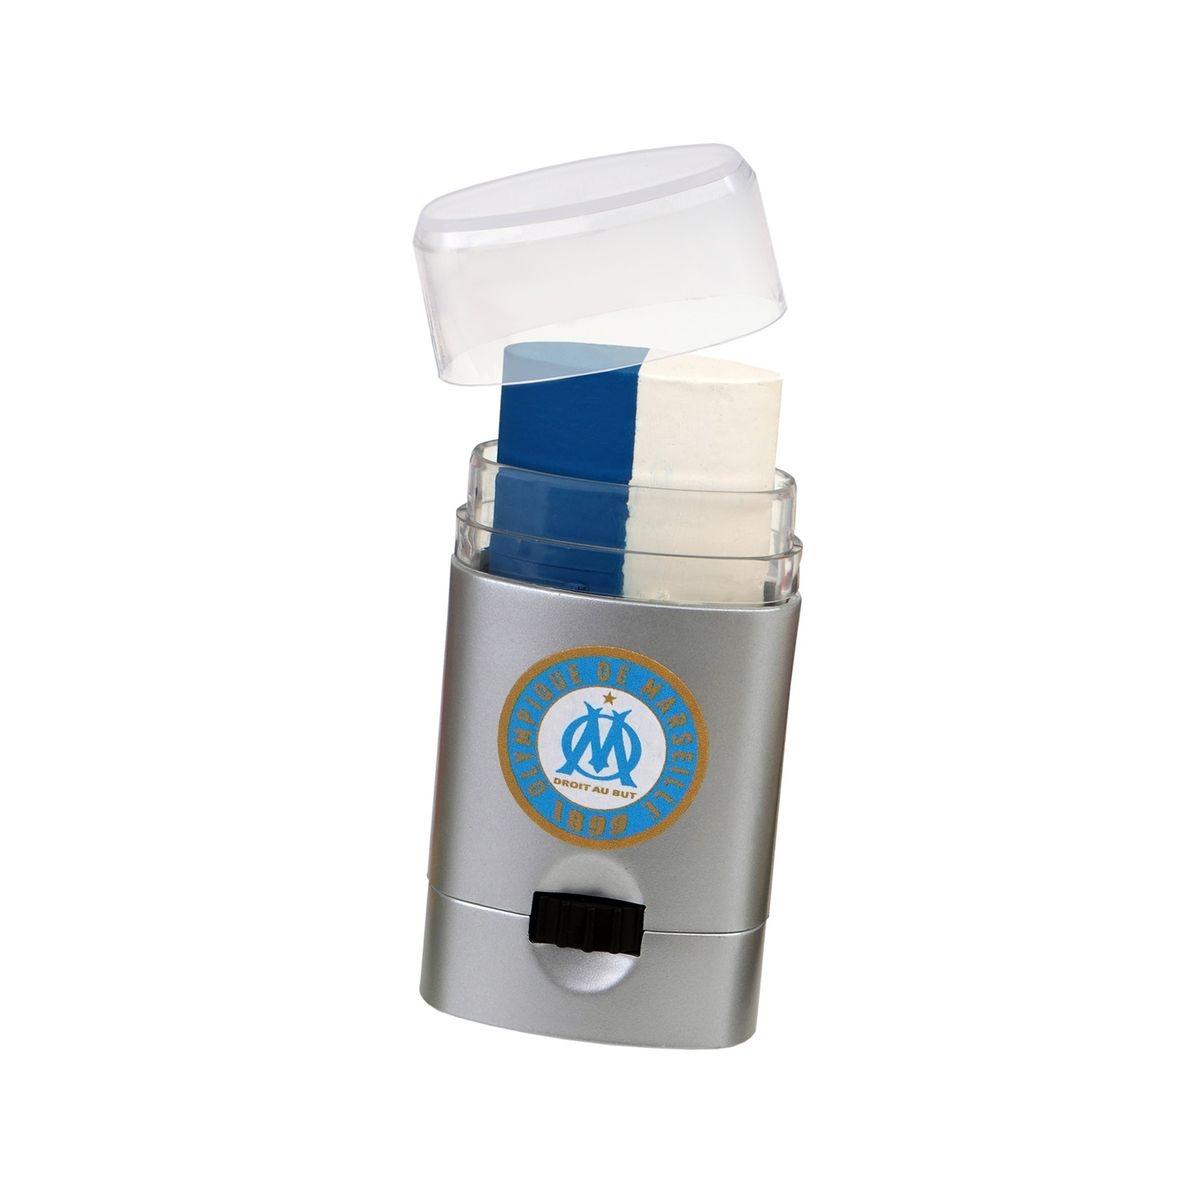 Stick de maquillage OM Bicolore Bleu/Blanc